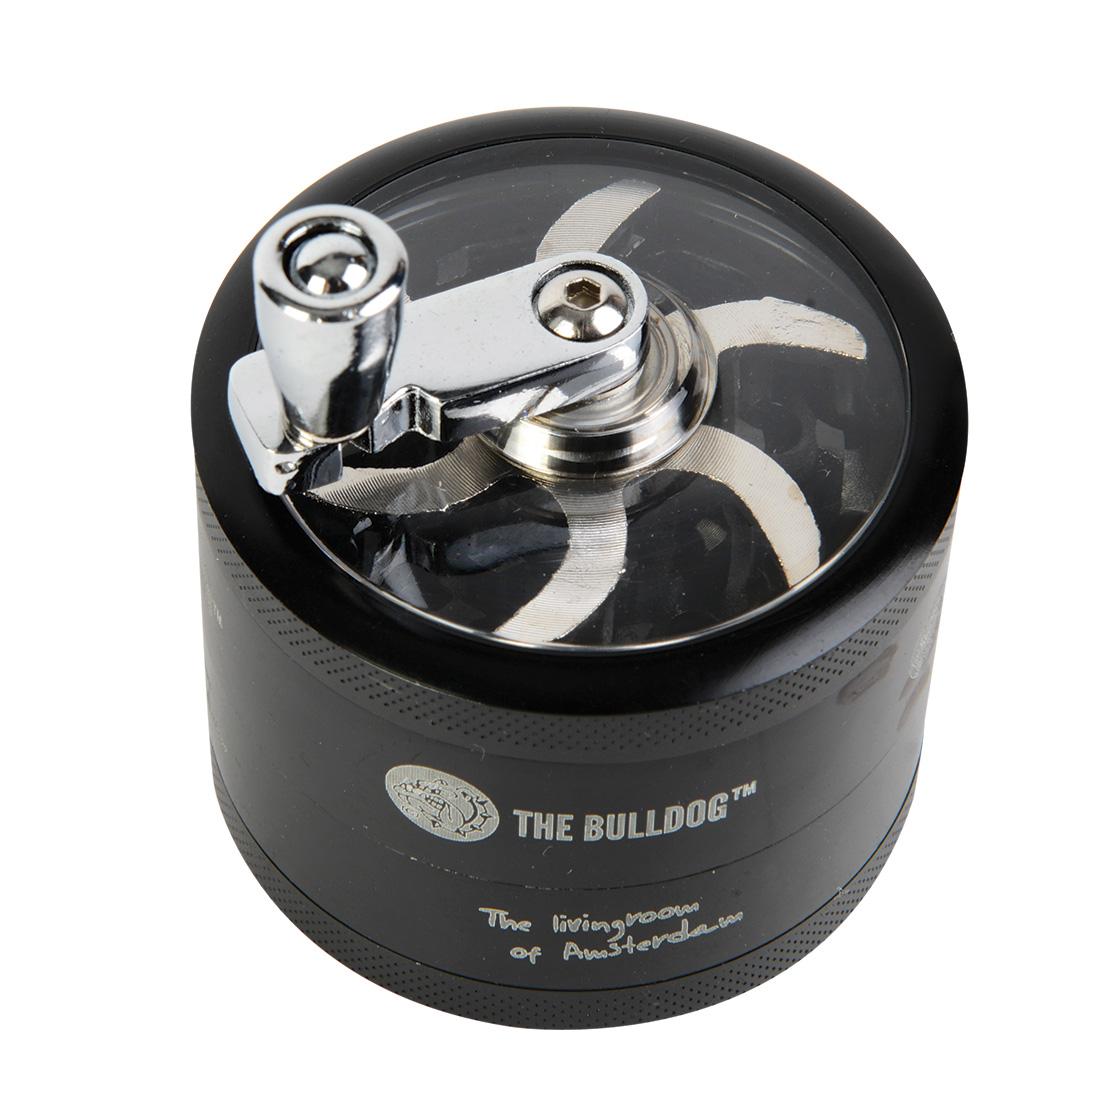 grinder à manivelle the bulldog